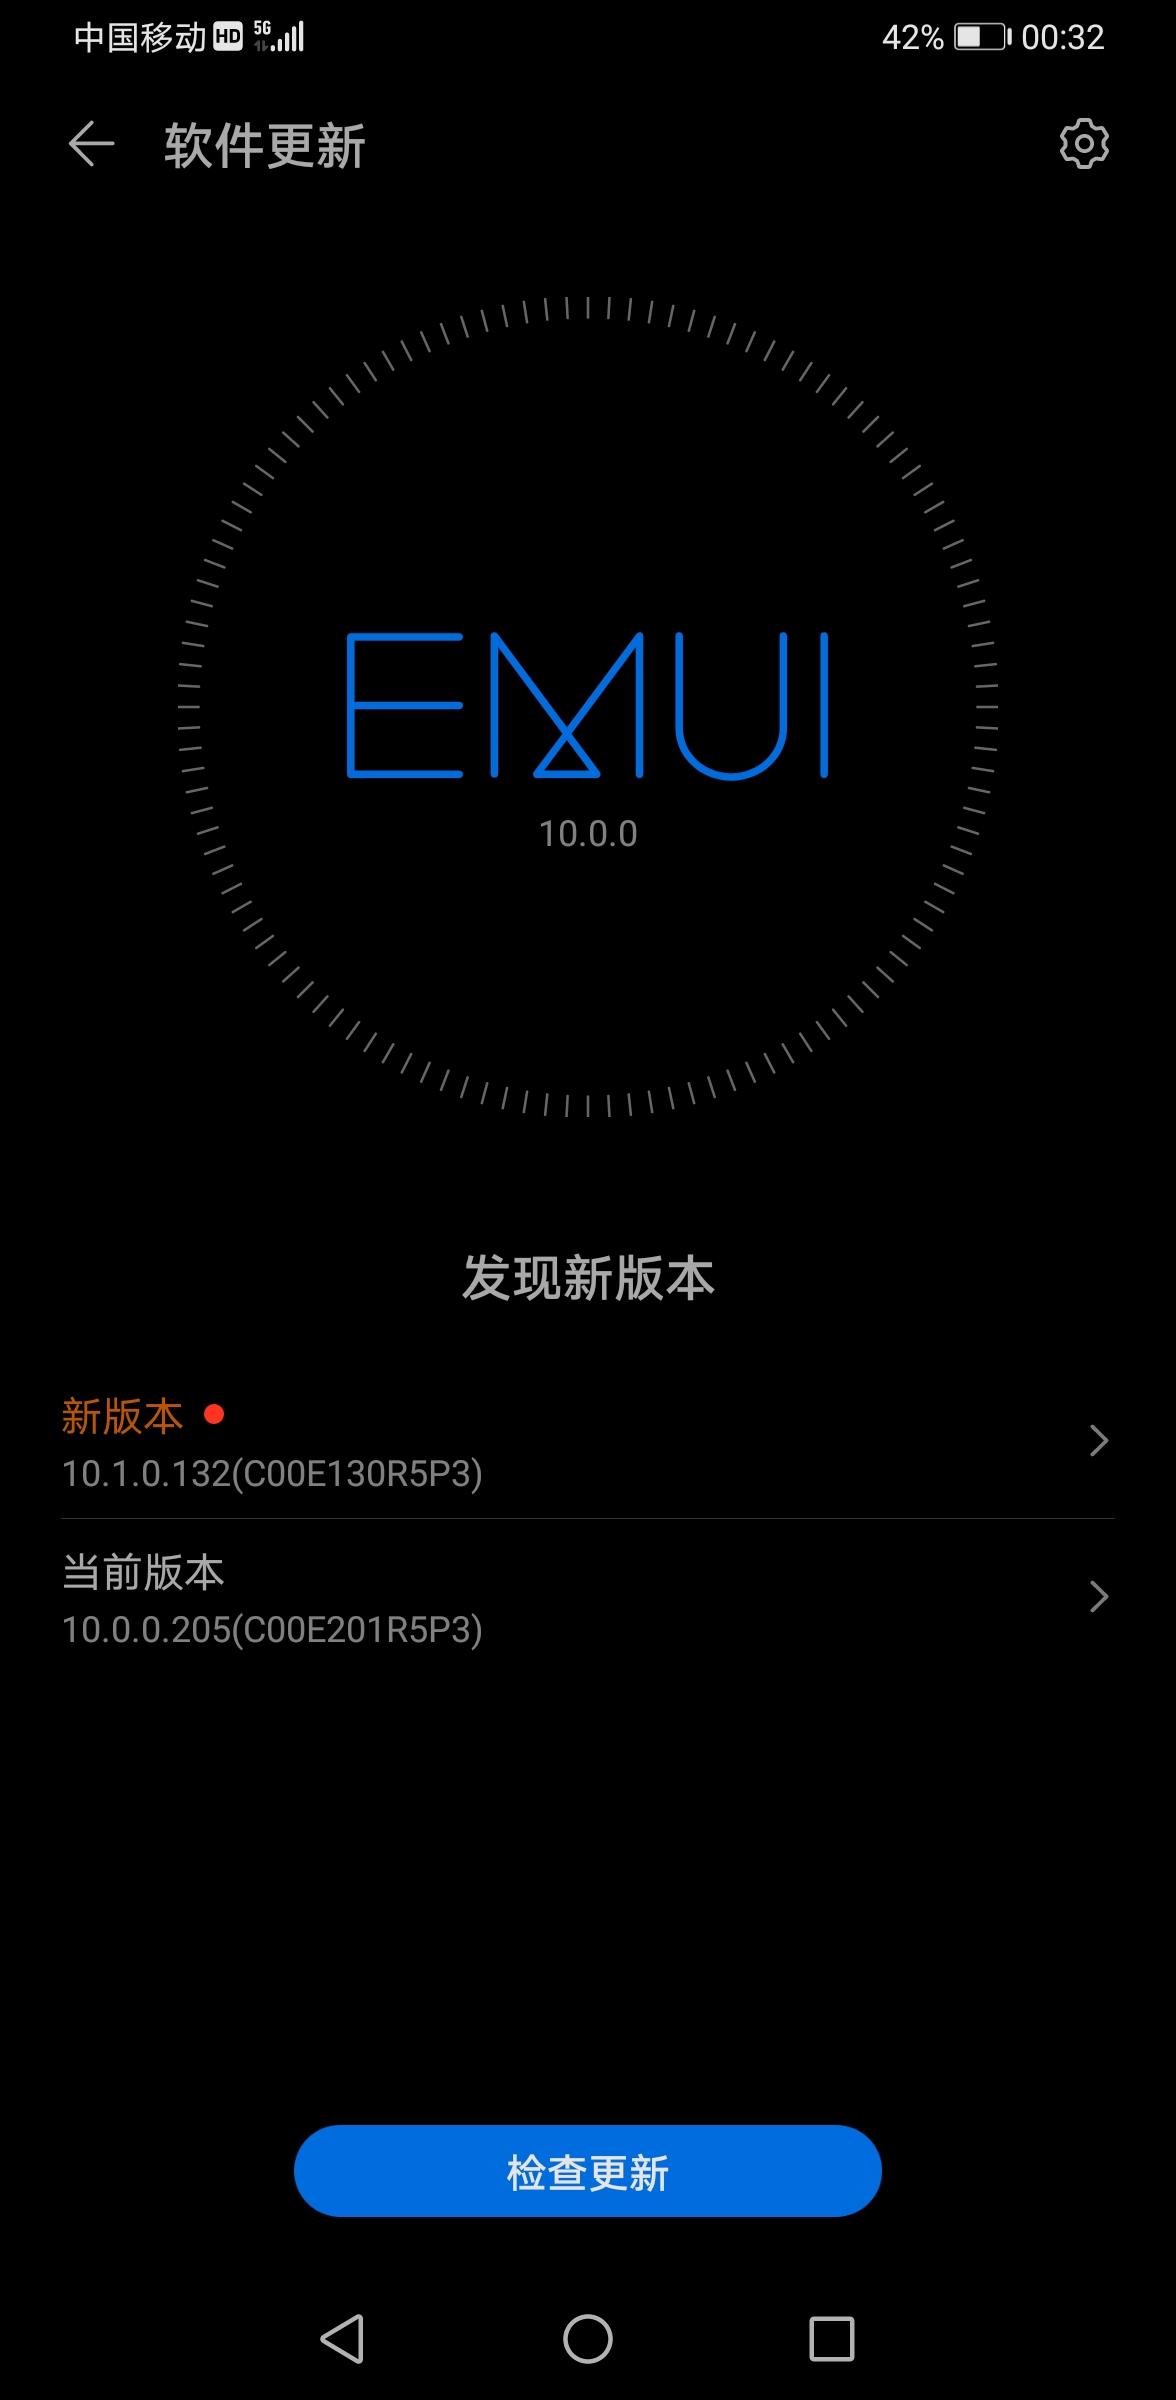 Screenshot_20200516_003254_com.huawei.android.hwouc.jpg